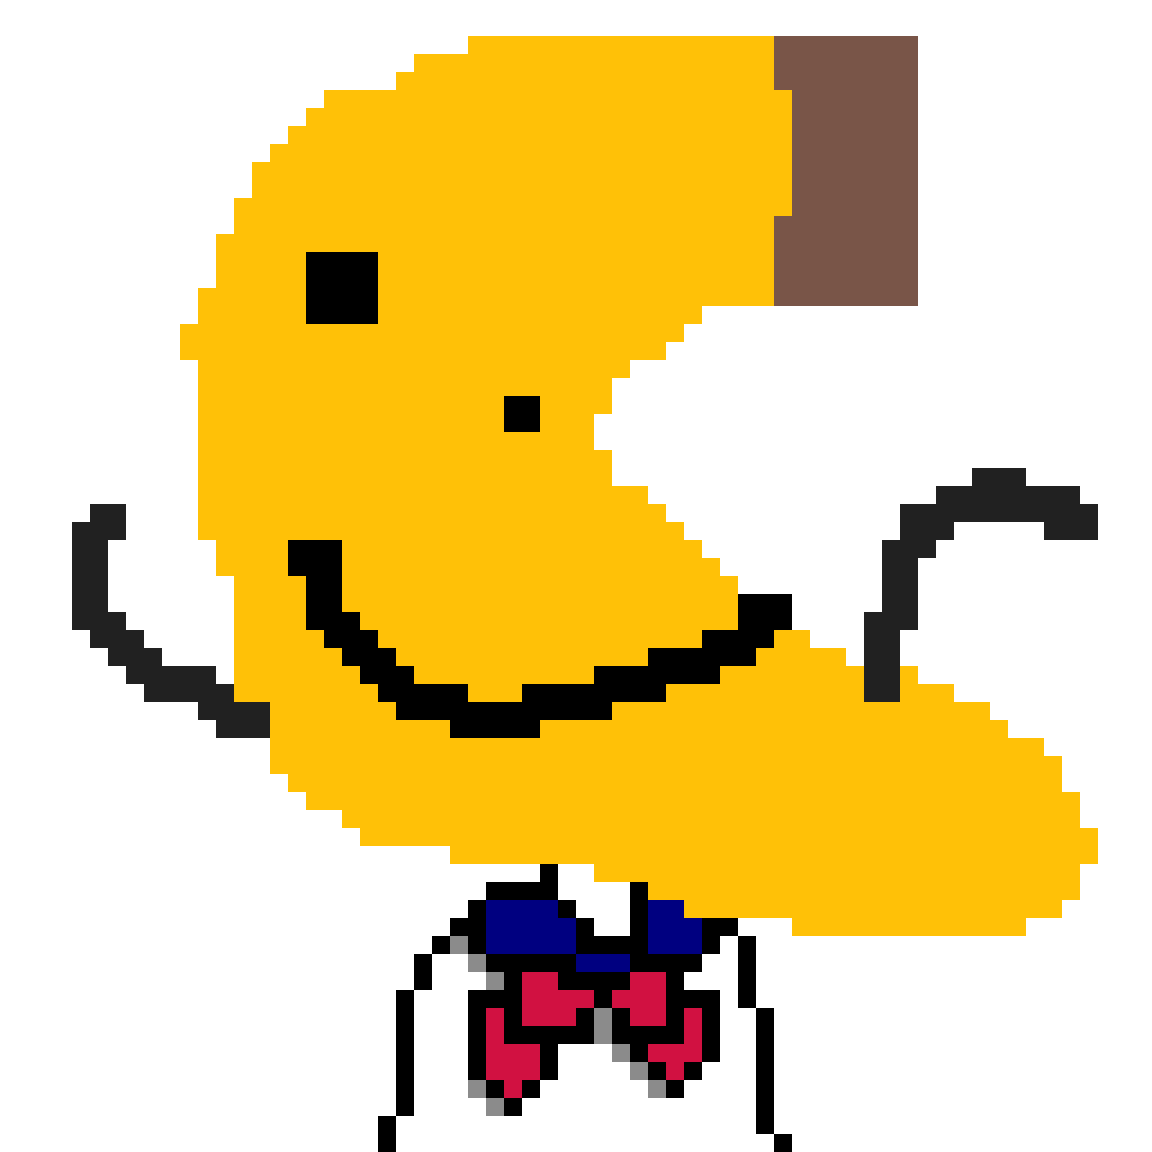 bananababble by MilesMoralesSM